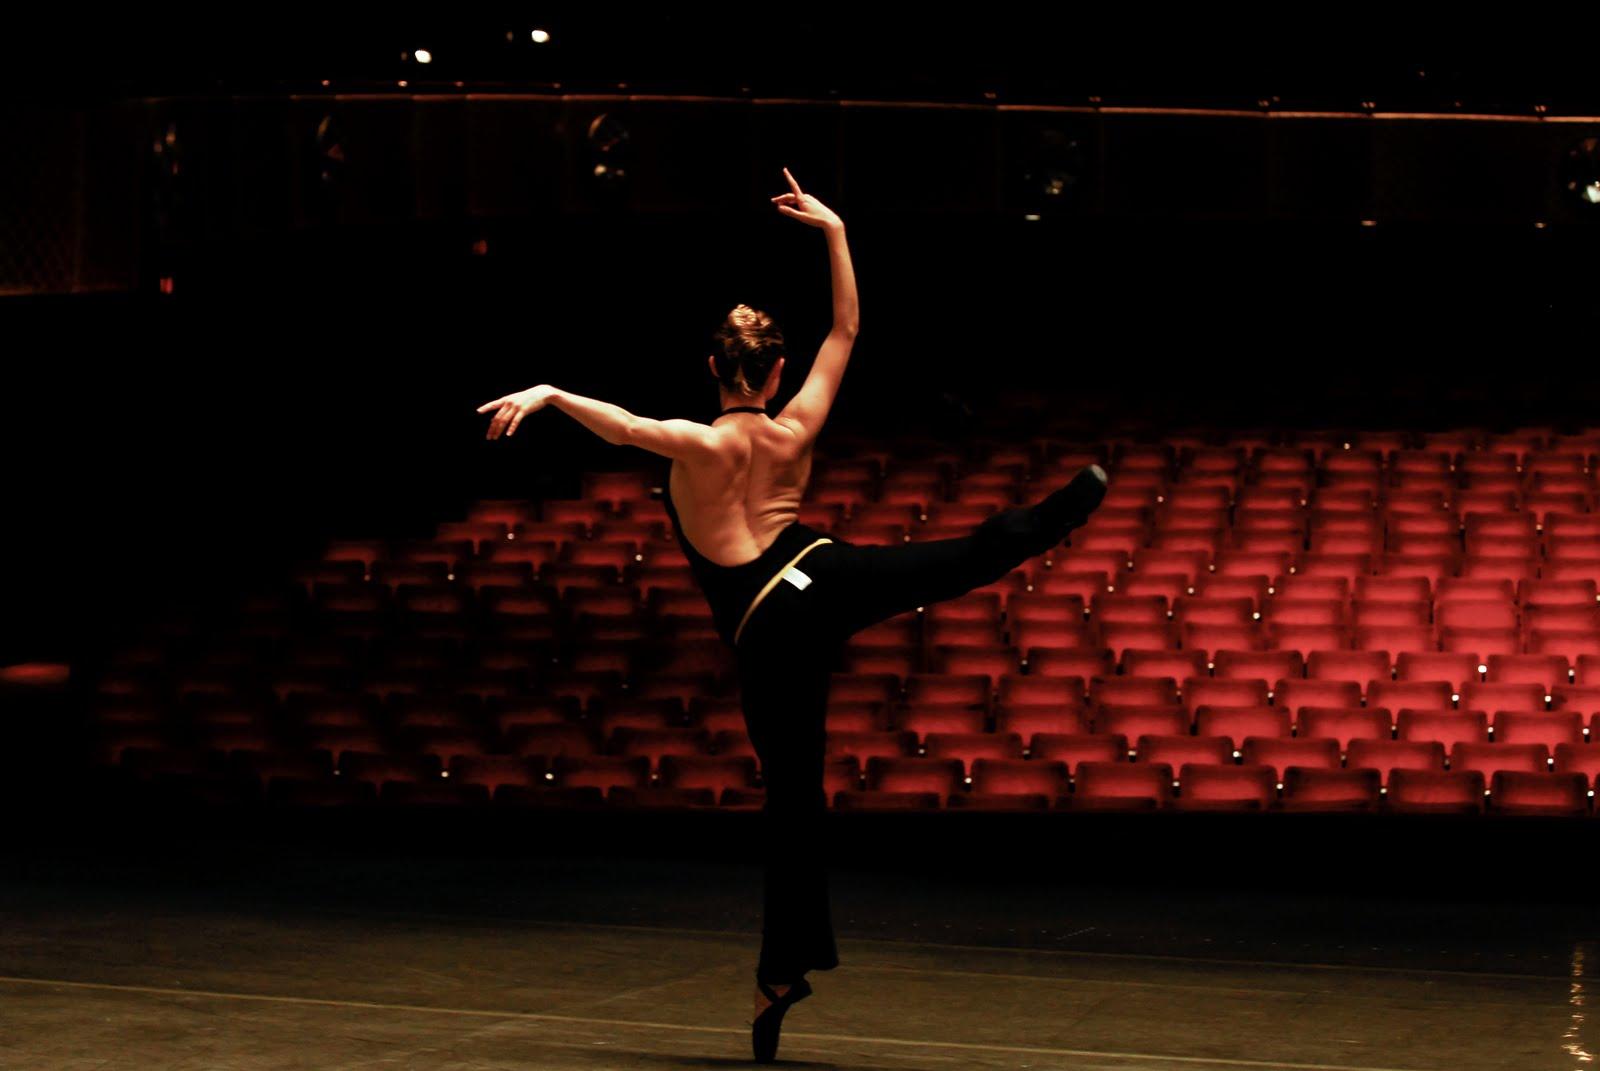 ballet dancers on stage - photo #8